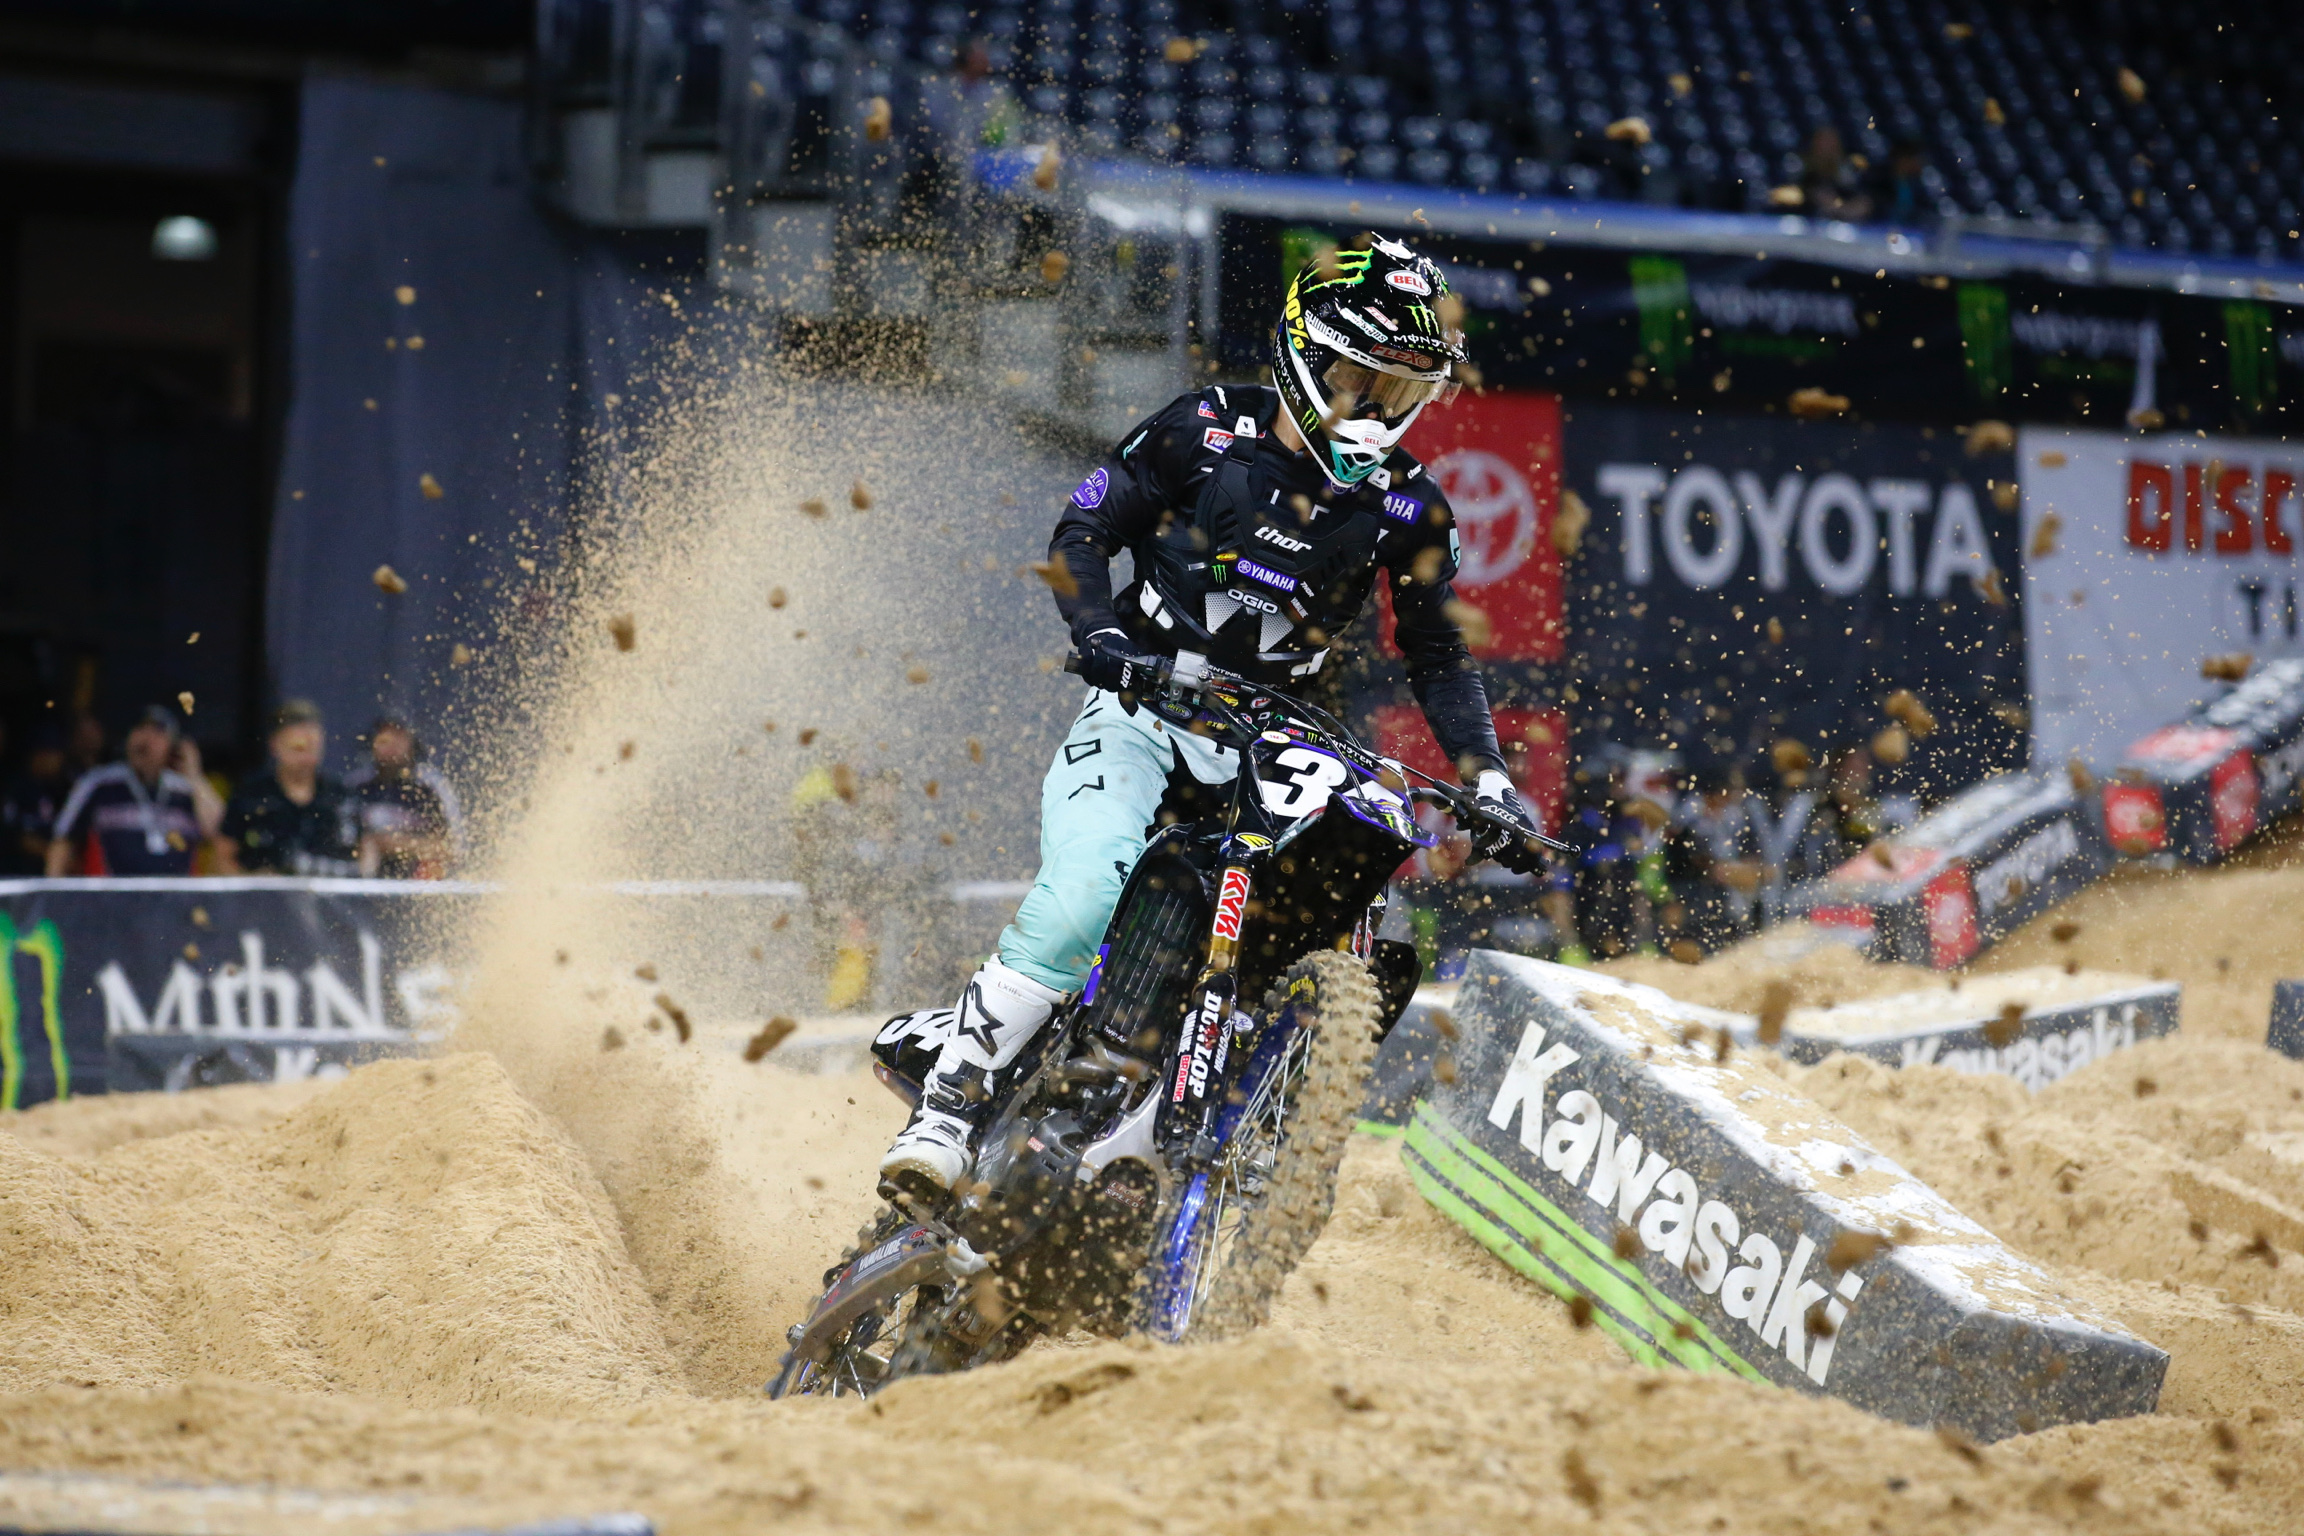 Ferrandis Houston - Credit Star Racing Yamaha